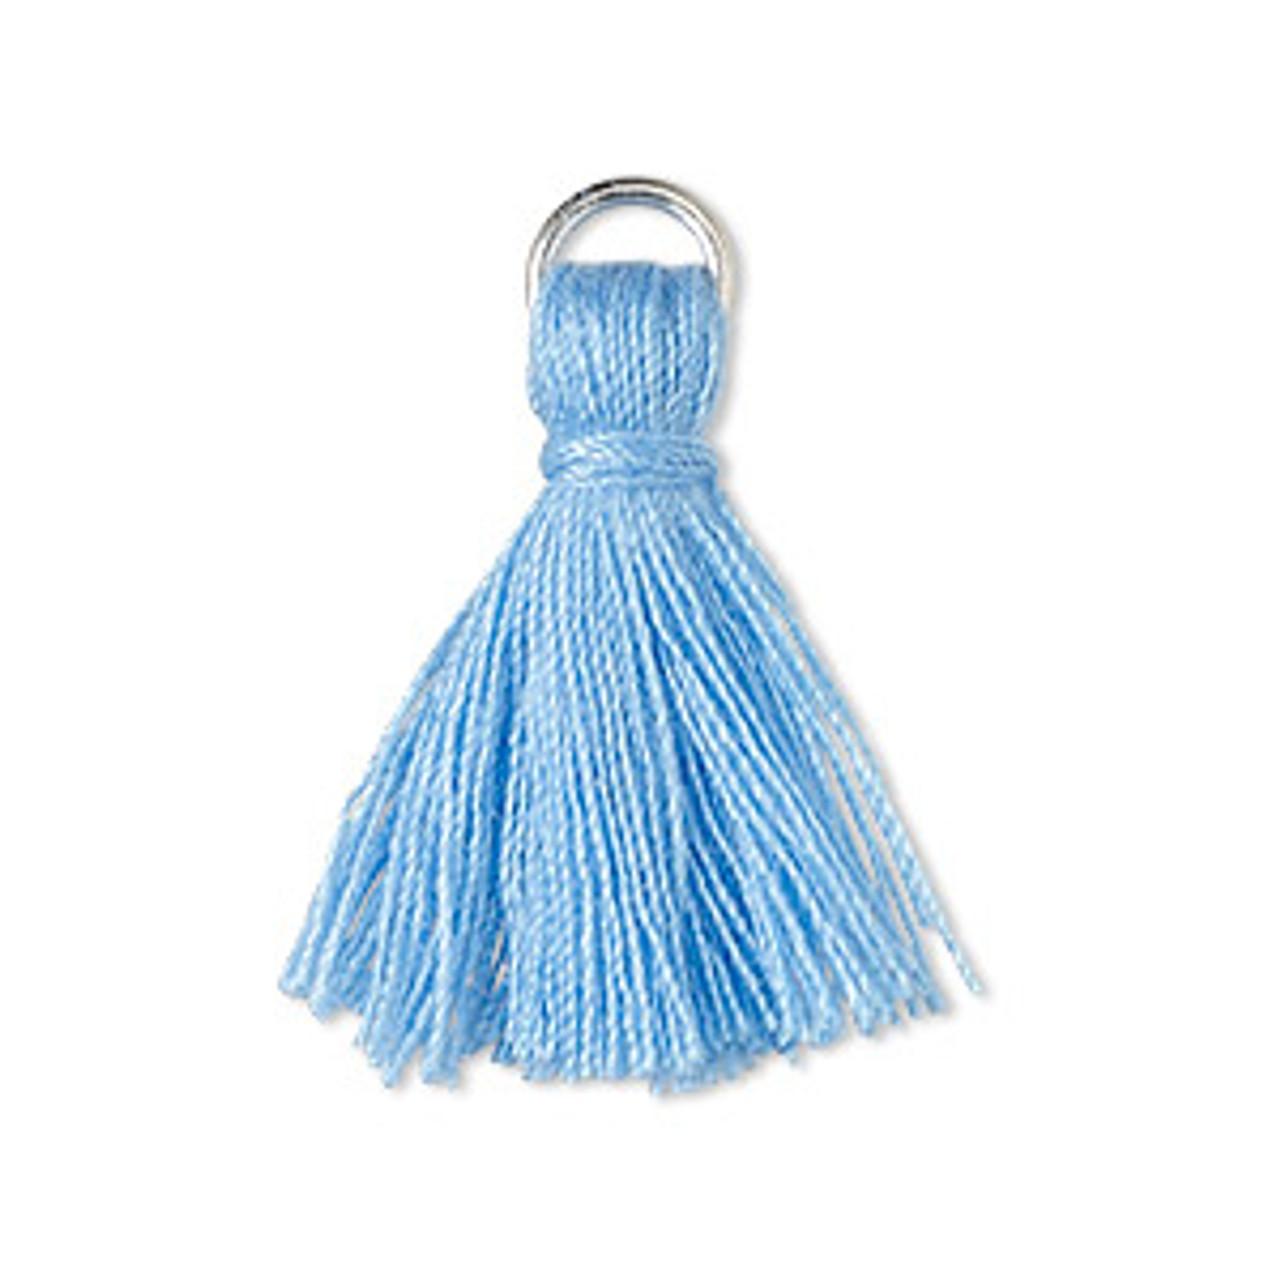 2pk 20-24mm Light Blue Mini Tassel with 6mm Ring